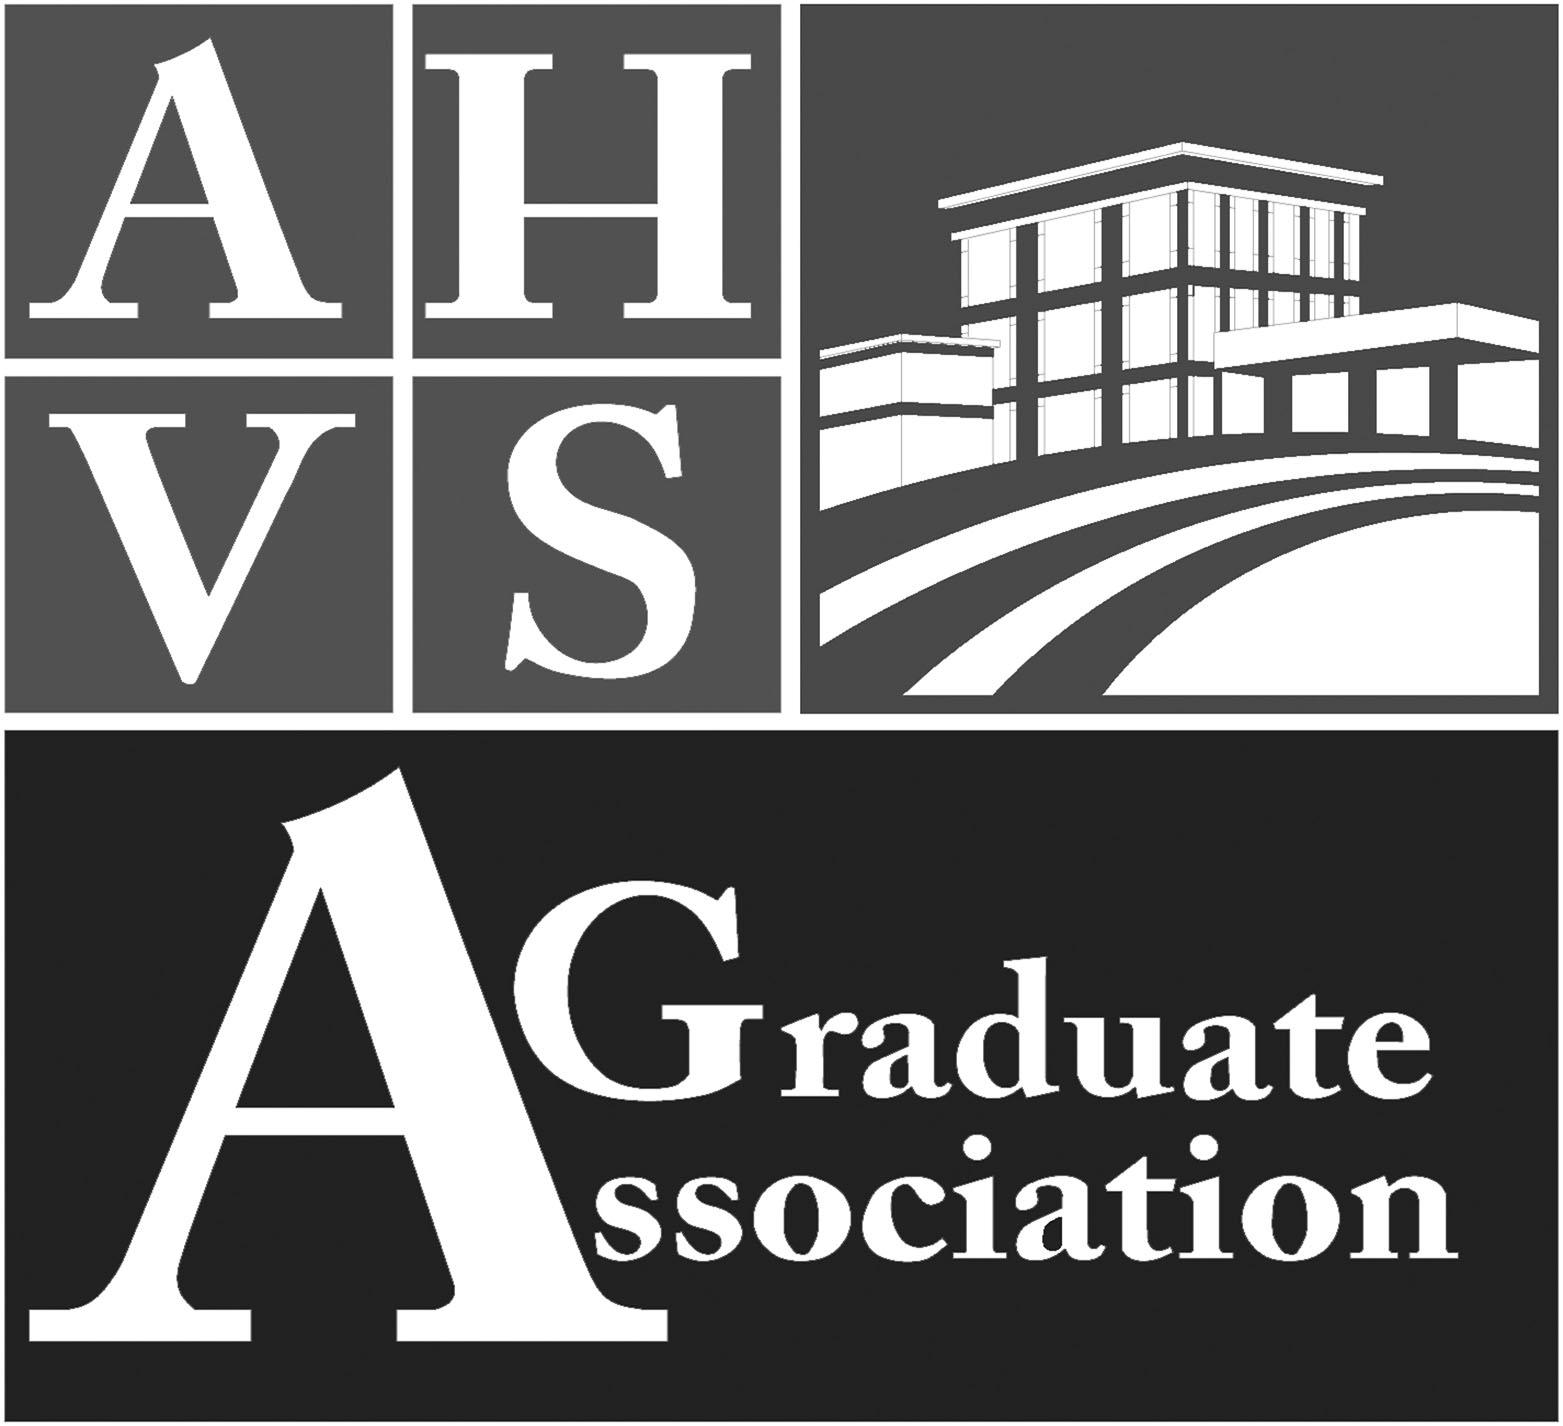 AHVS Graduate Association